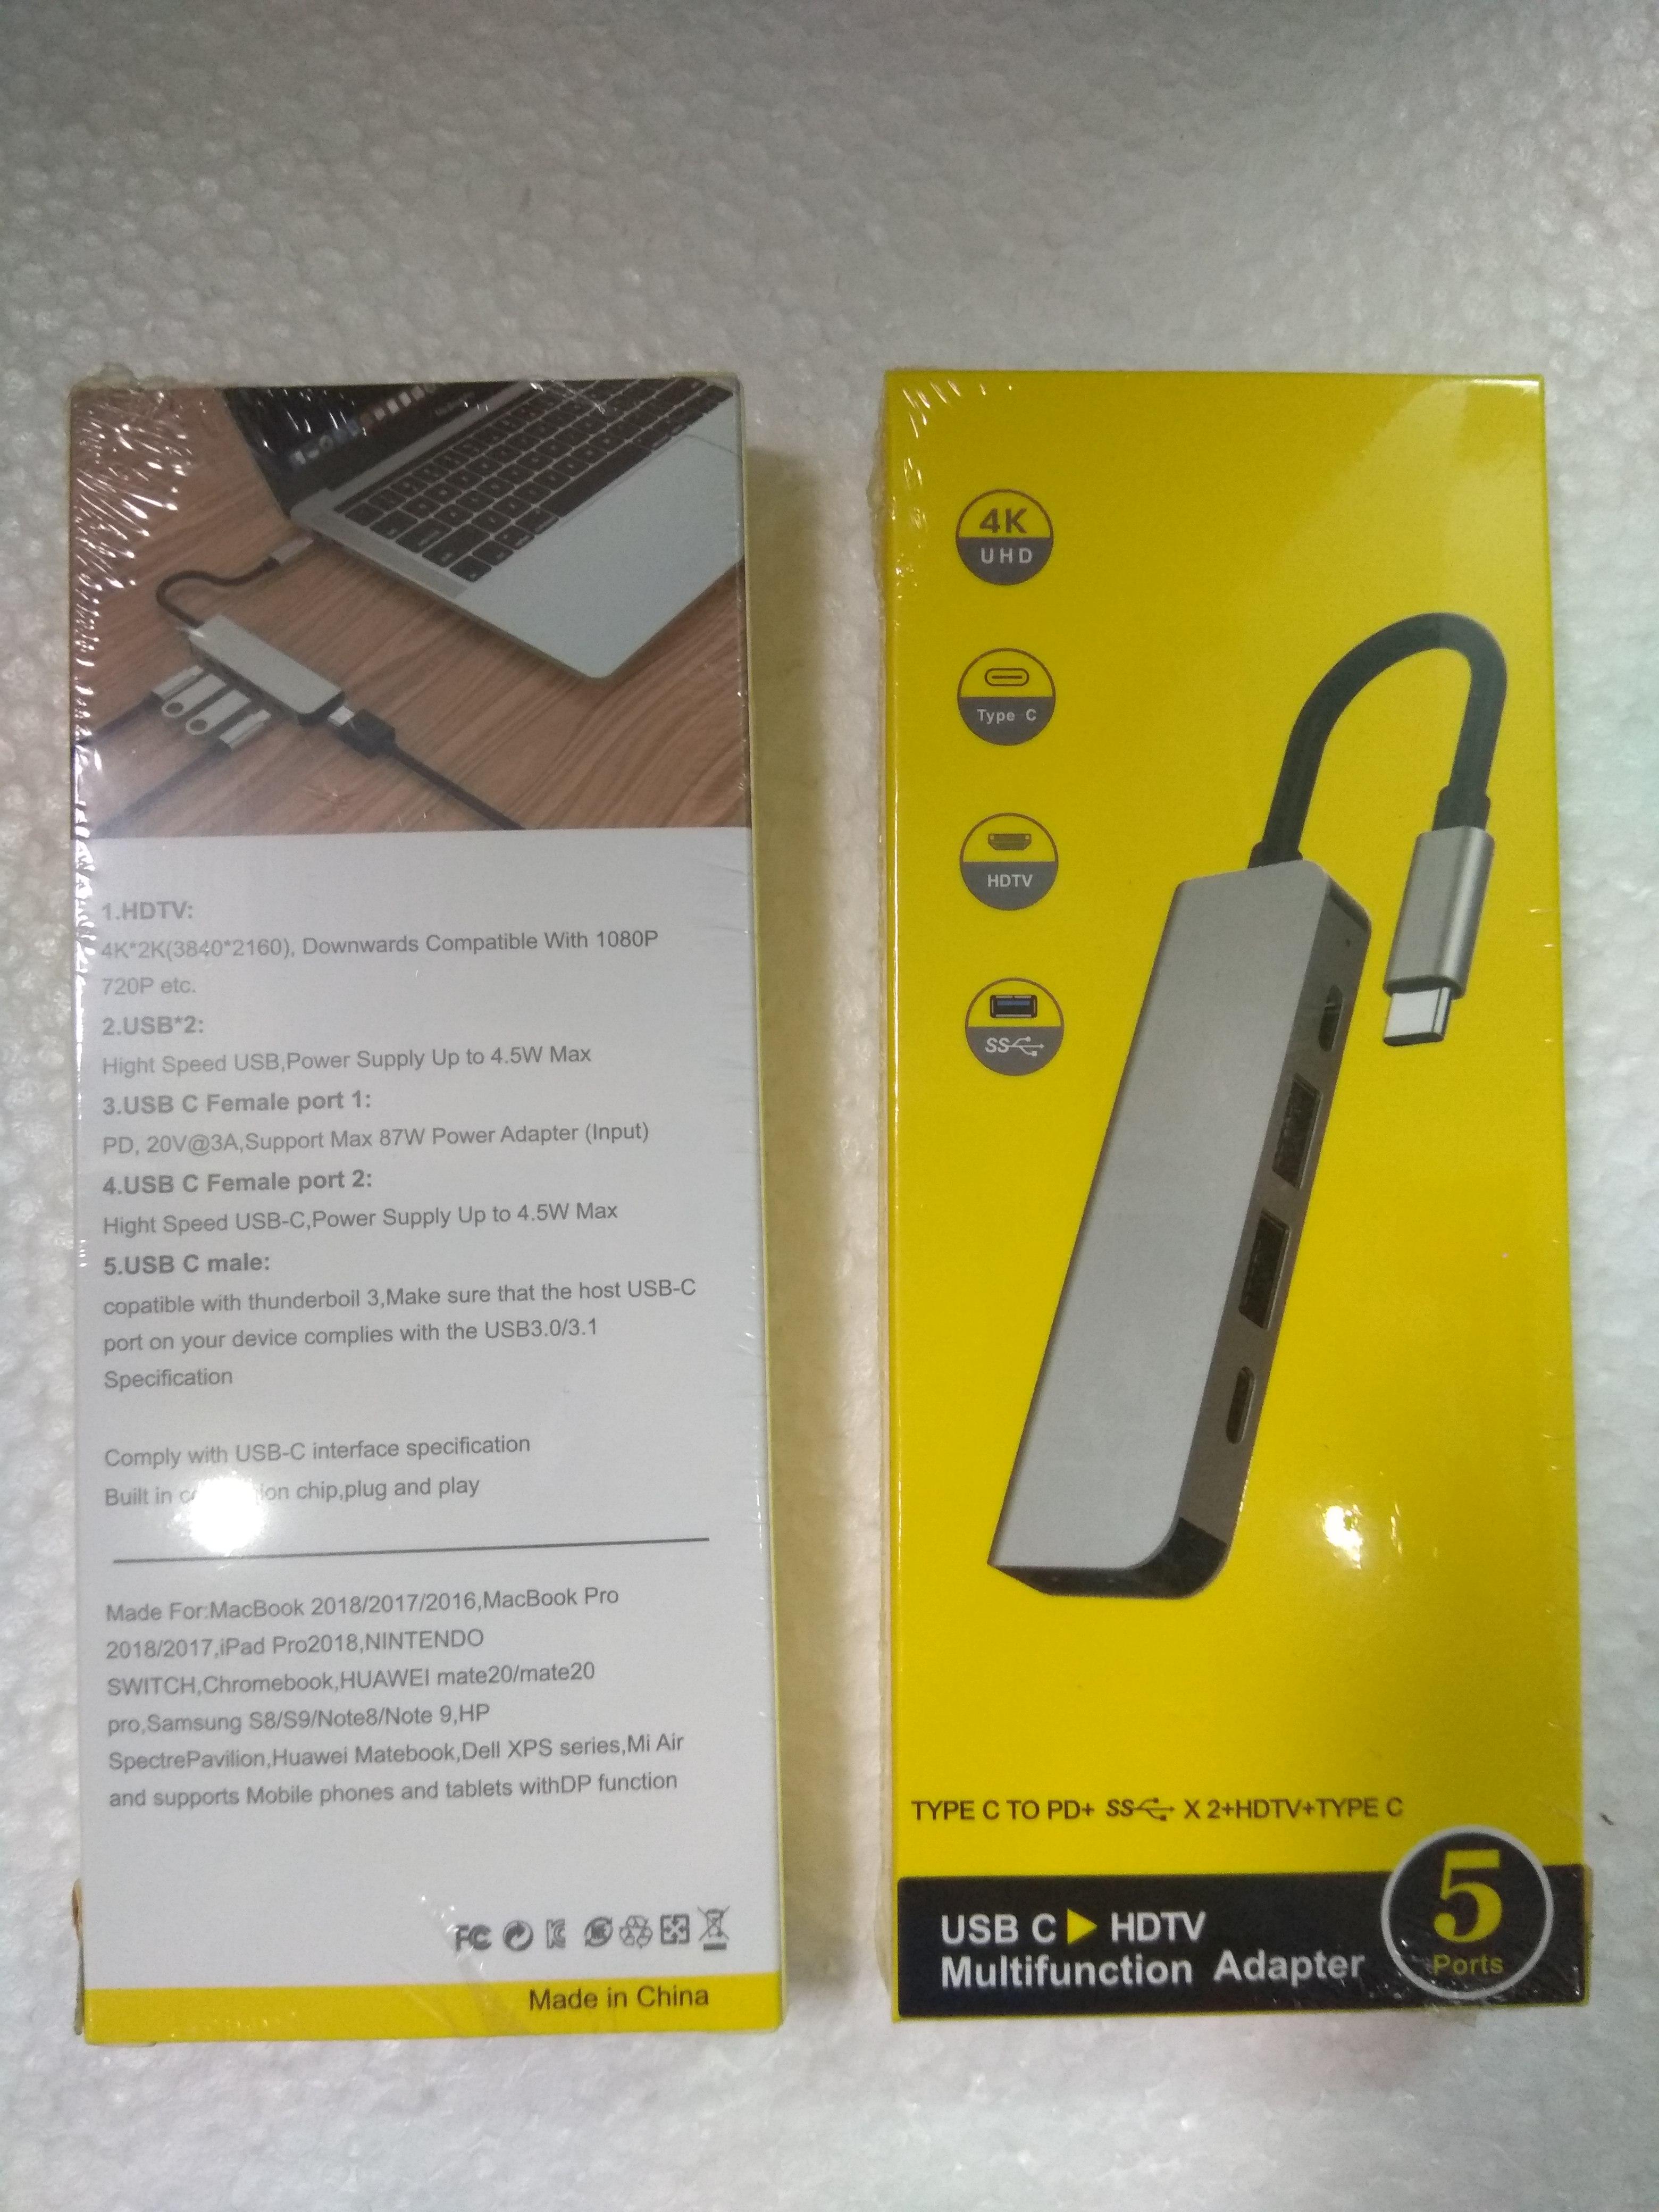 Hub USB Type-C 5 Cổng HDMI 4K 60Hz/ USB 3.0/ Type-C/ PD 50538 - 5in1-3 60Hz